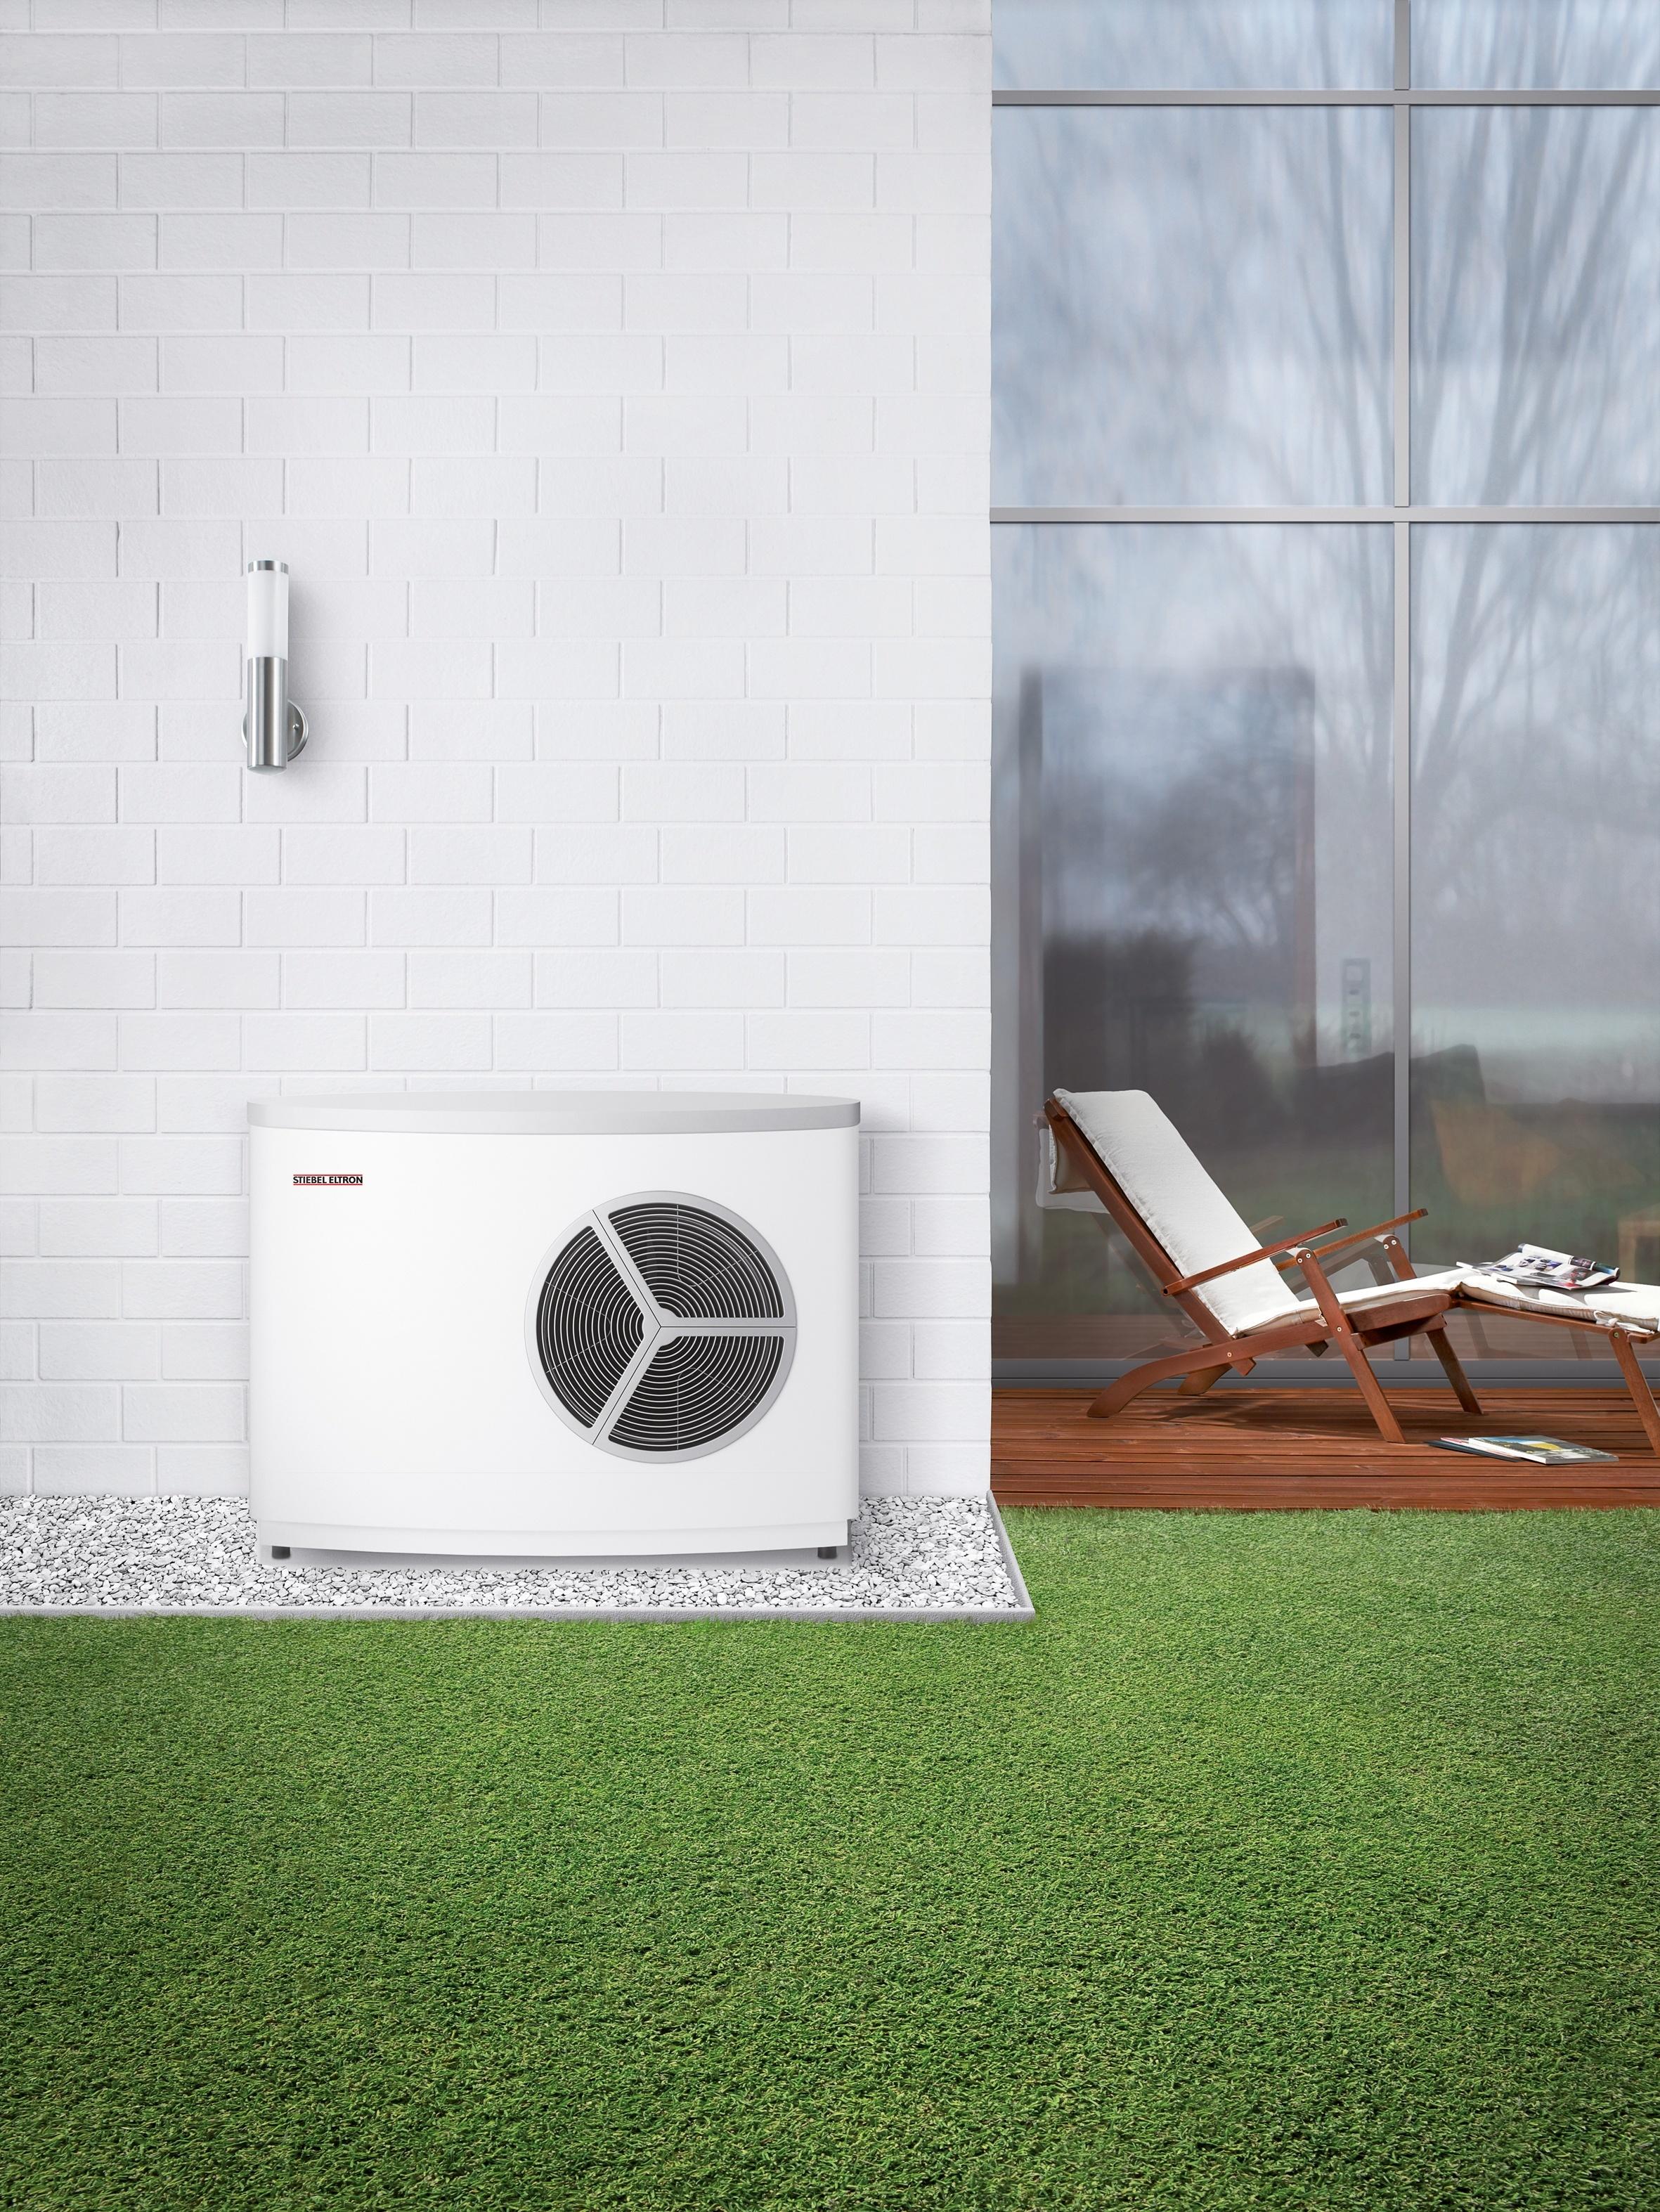 juni 2012 wirtschaftspress. Black Bedroom Furniture Sets. Home Design Ideas